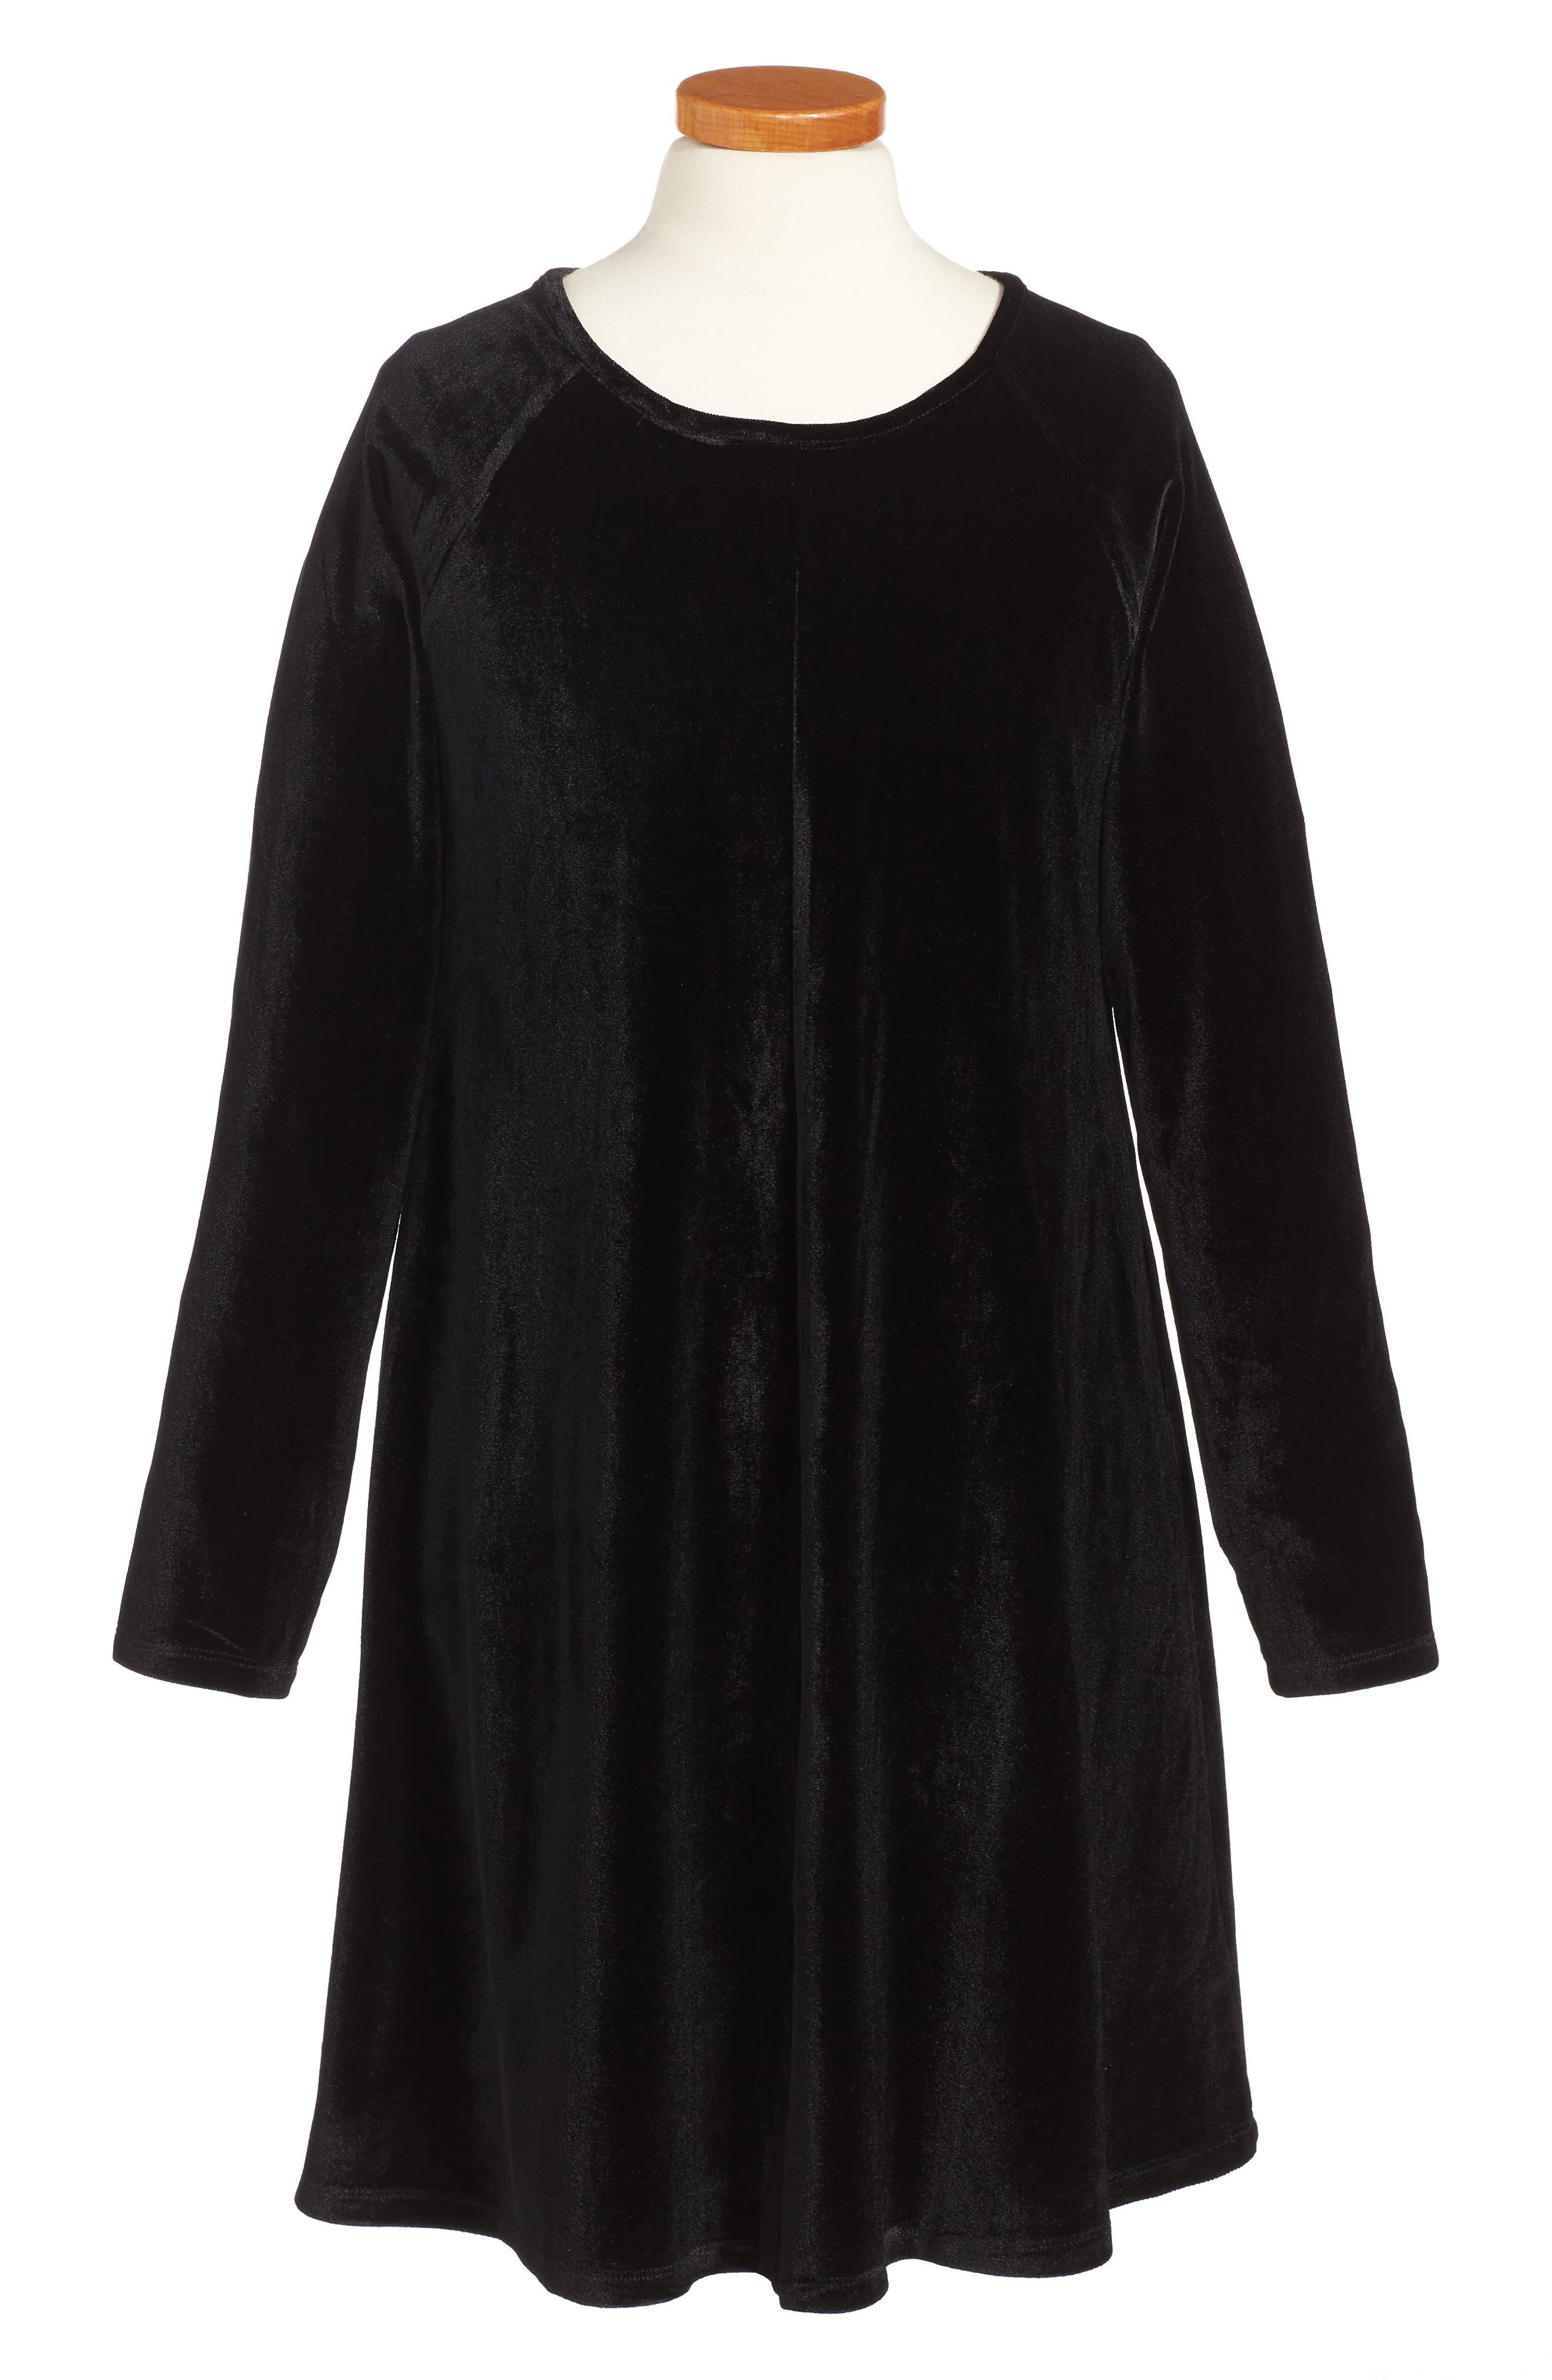 Main Image - Miss Behave Barbara Dress (Big Girls)